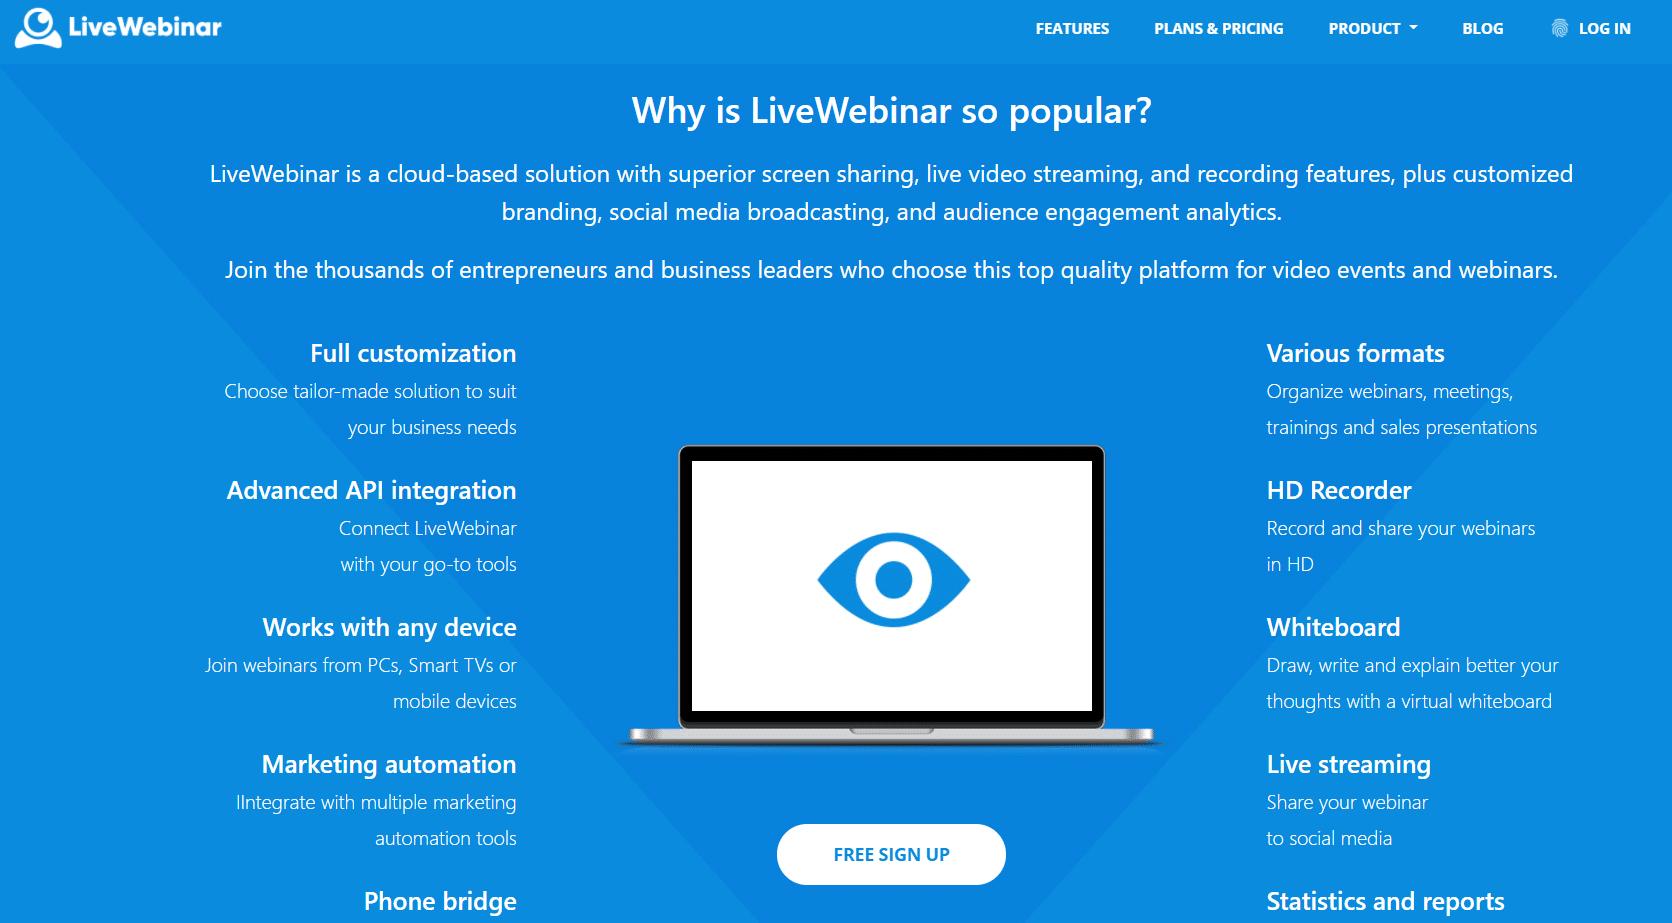 livewebinar-sales-conversion